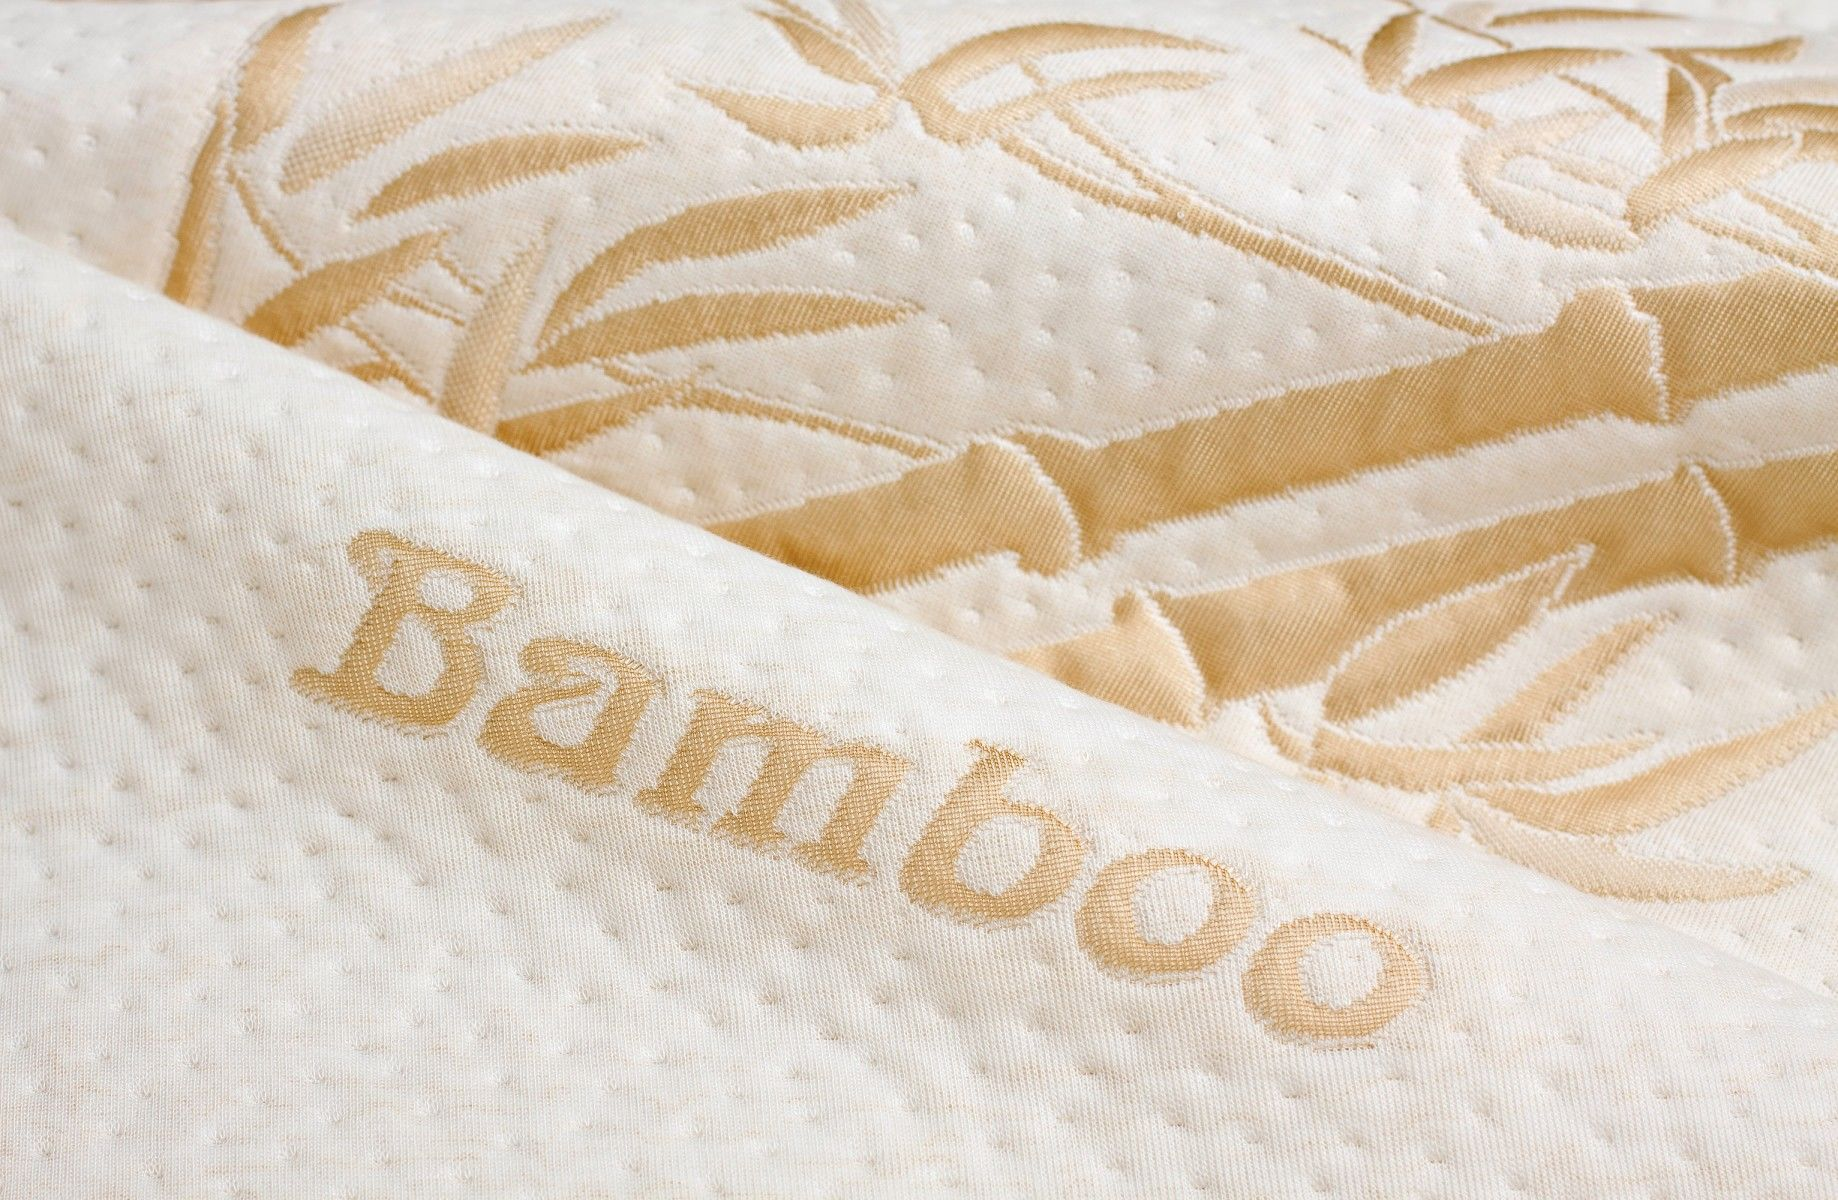 Pokrowiec na materac BAMBO 80x190 - Dostawa Gratis!